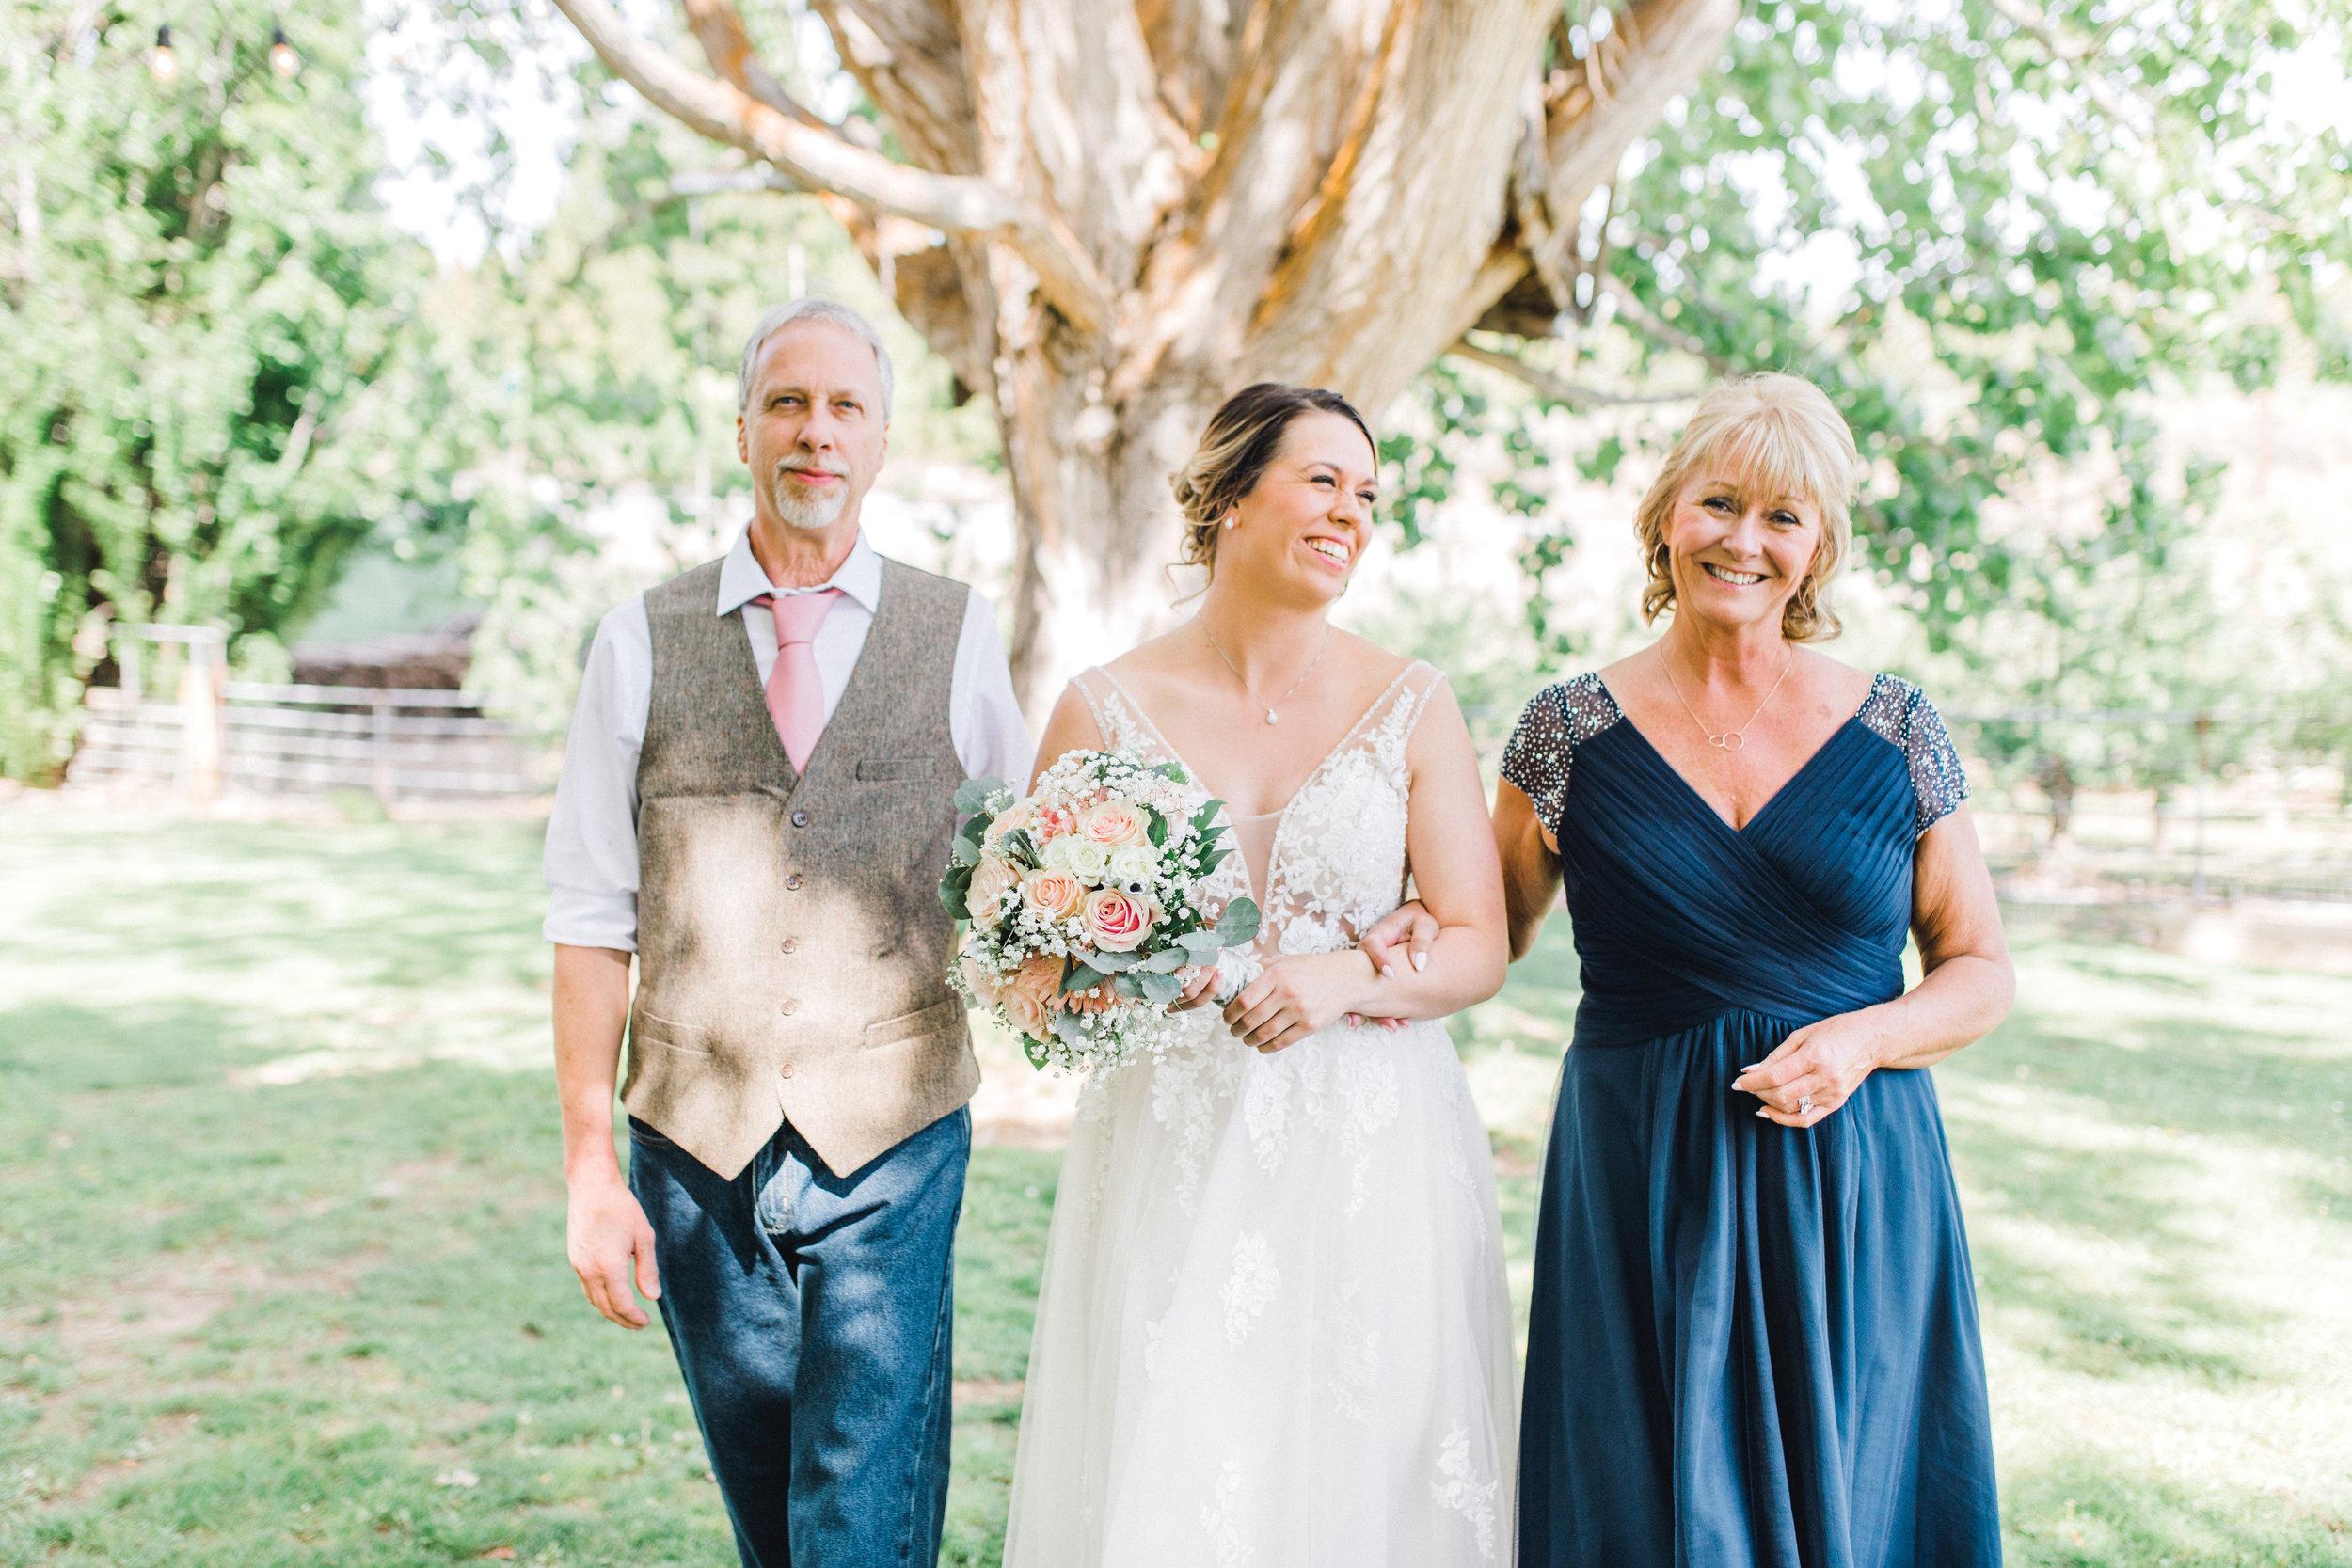 FAVORITES-2019-05-04 Kele and Matt Wedding450-38.jpg